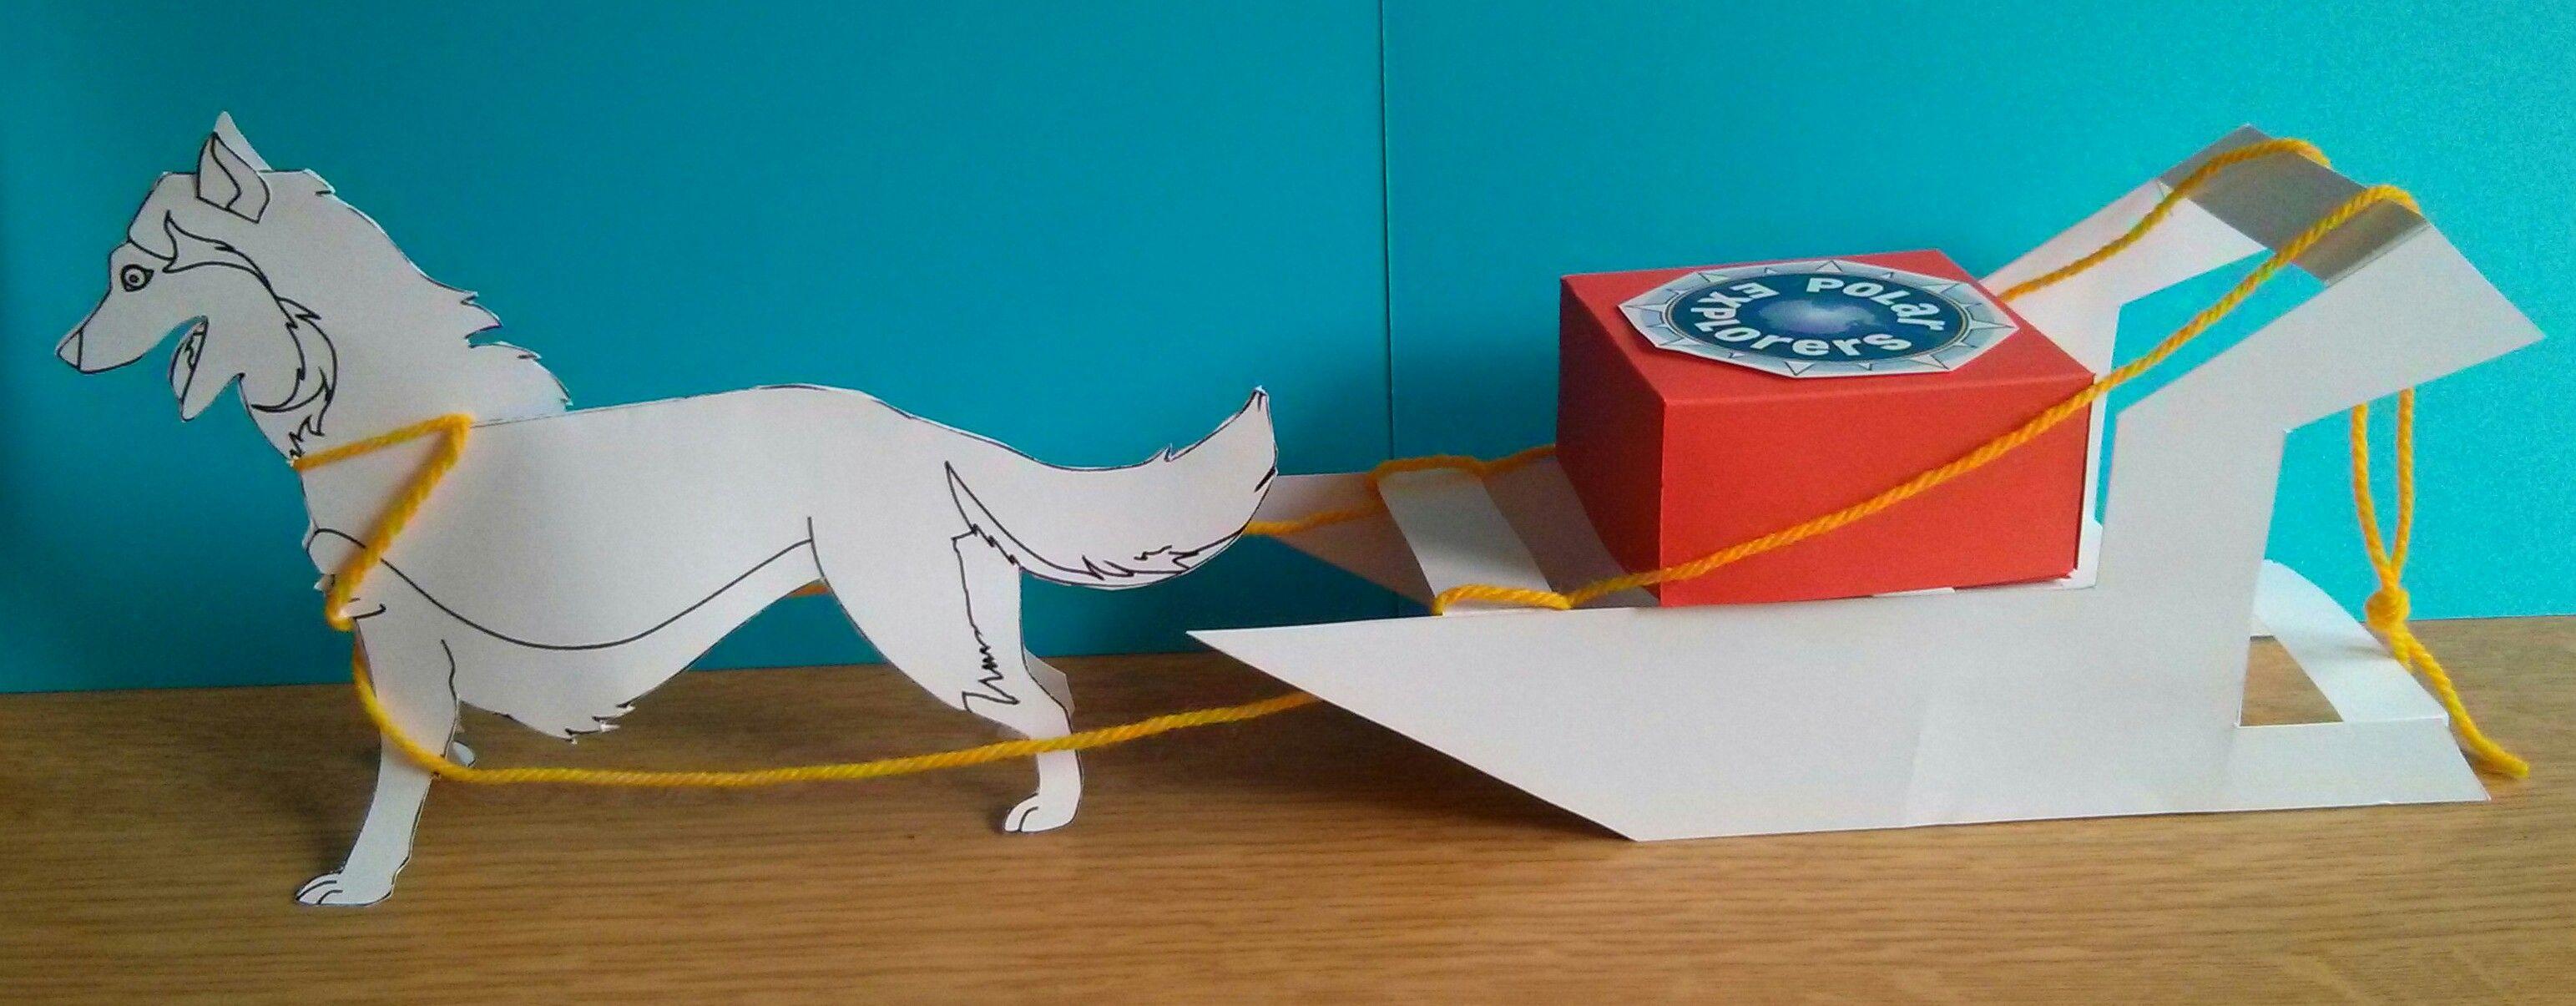 Dog Sled Craft - Children Colour Decorate '